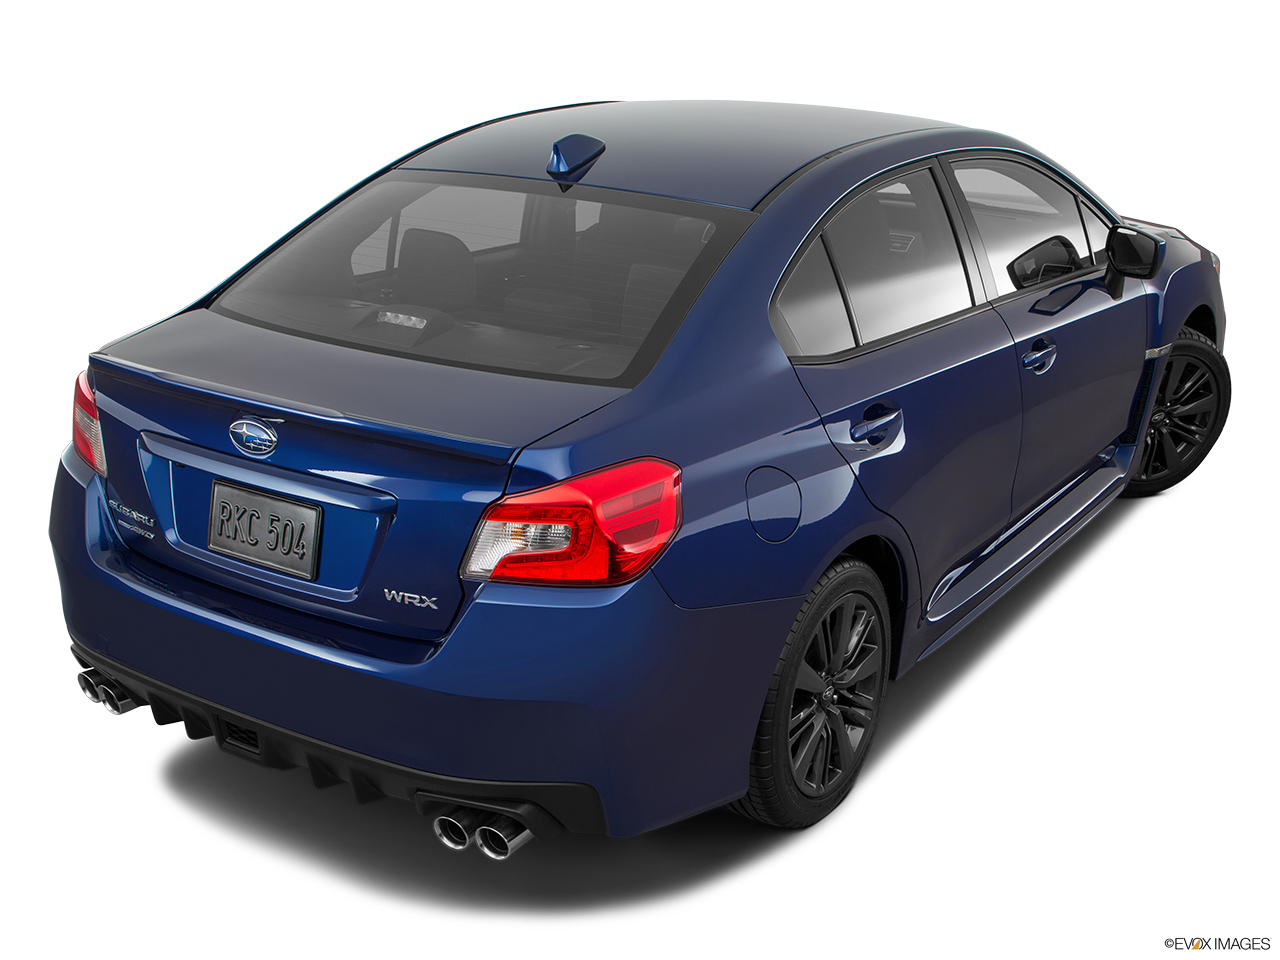 Wrx Cvt 0 60 >> Subaru WRX 2018 2.0L EX Package M/T in Saudi Arabia: New Car Prices, Specs, Reviews & Photos ...